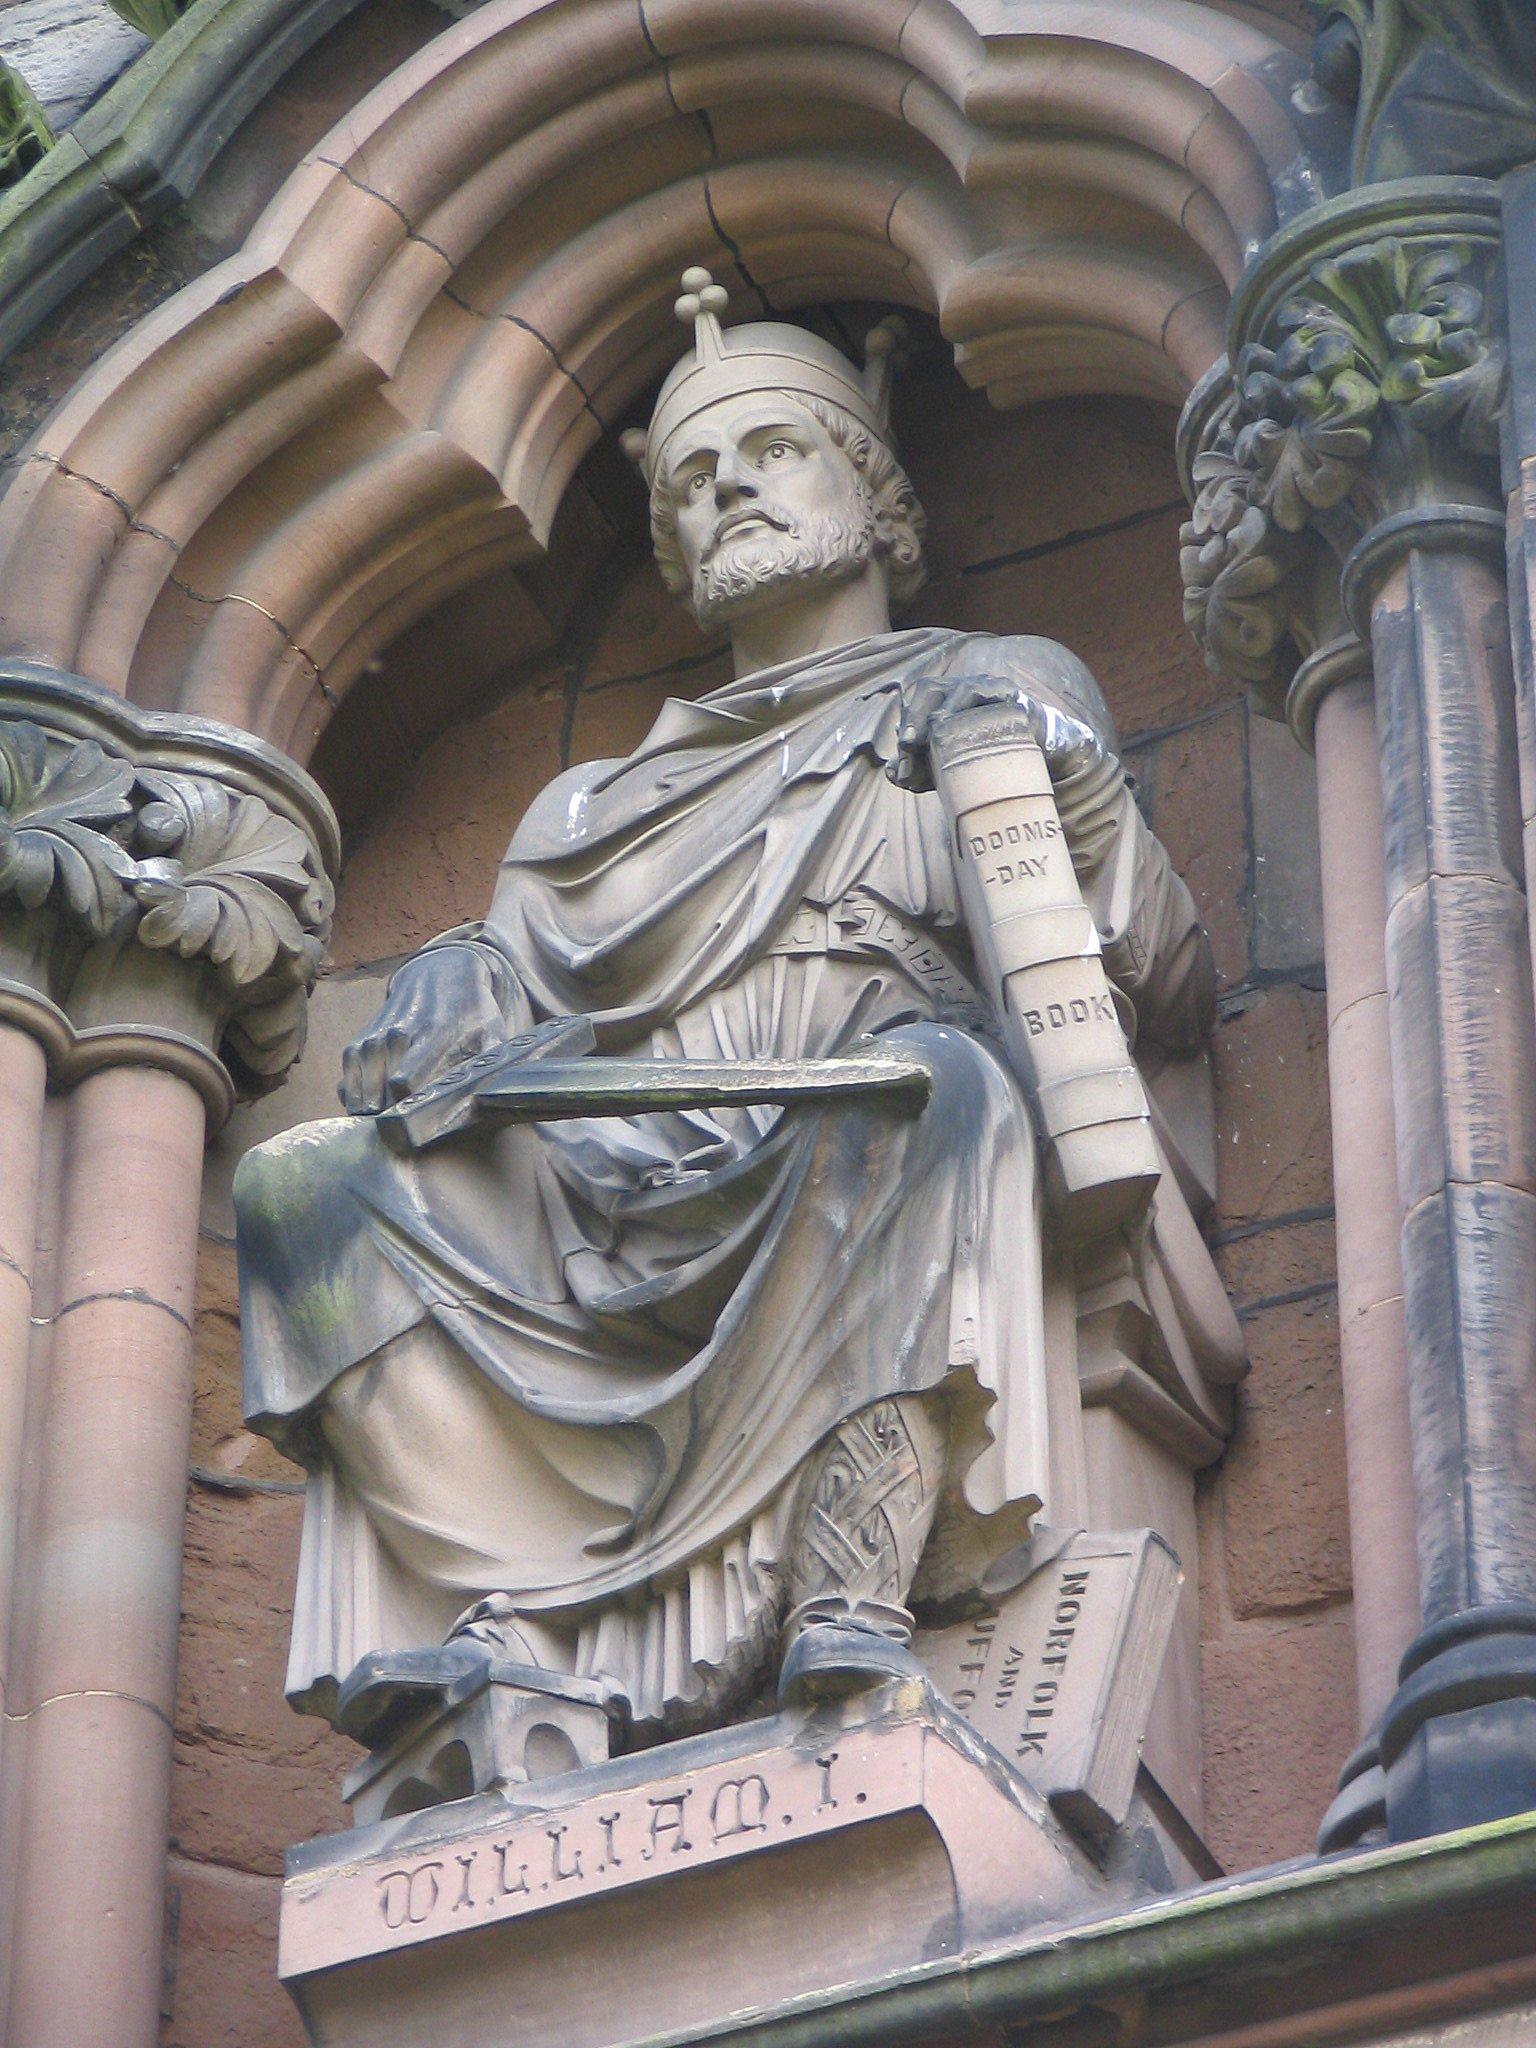 Statue of William the Conqueror on Lichfield Cathedral   Wikimedia Commons Public Domain Image